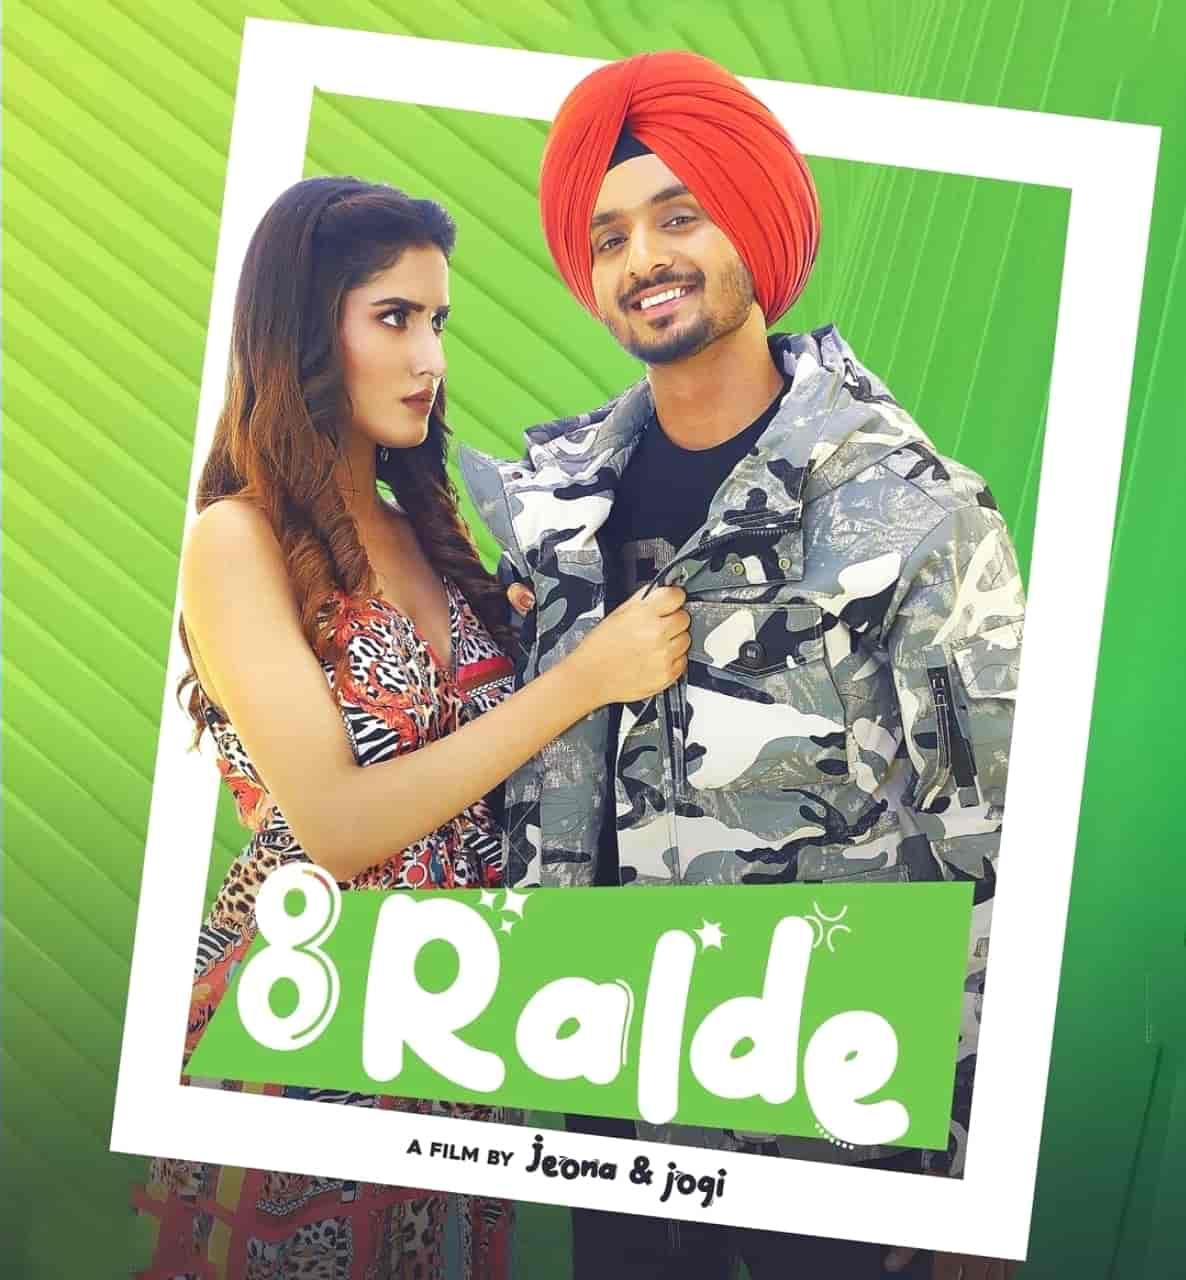 8 Ralde Punjabi Song Lyrics Nirvair Pannu